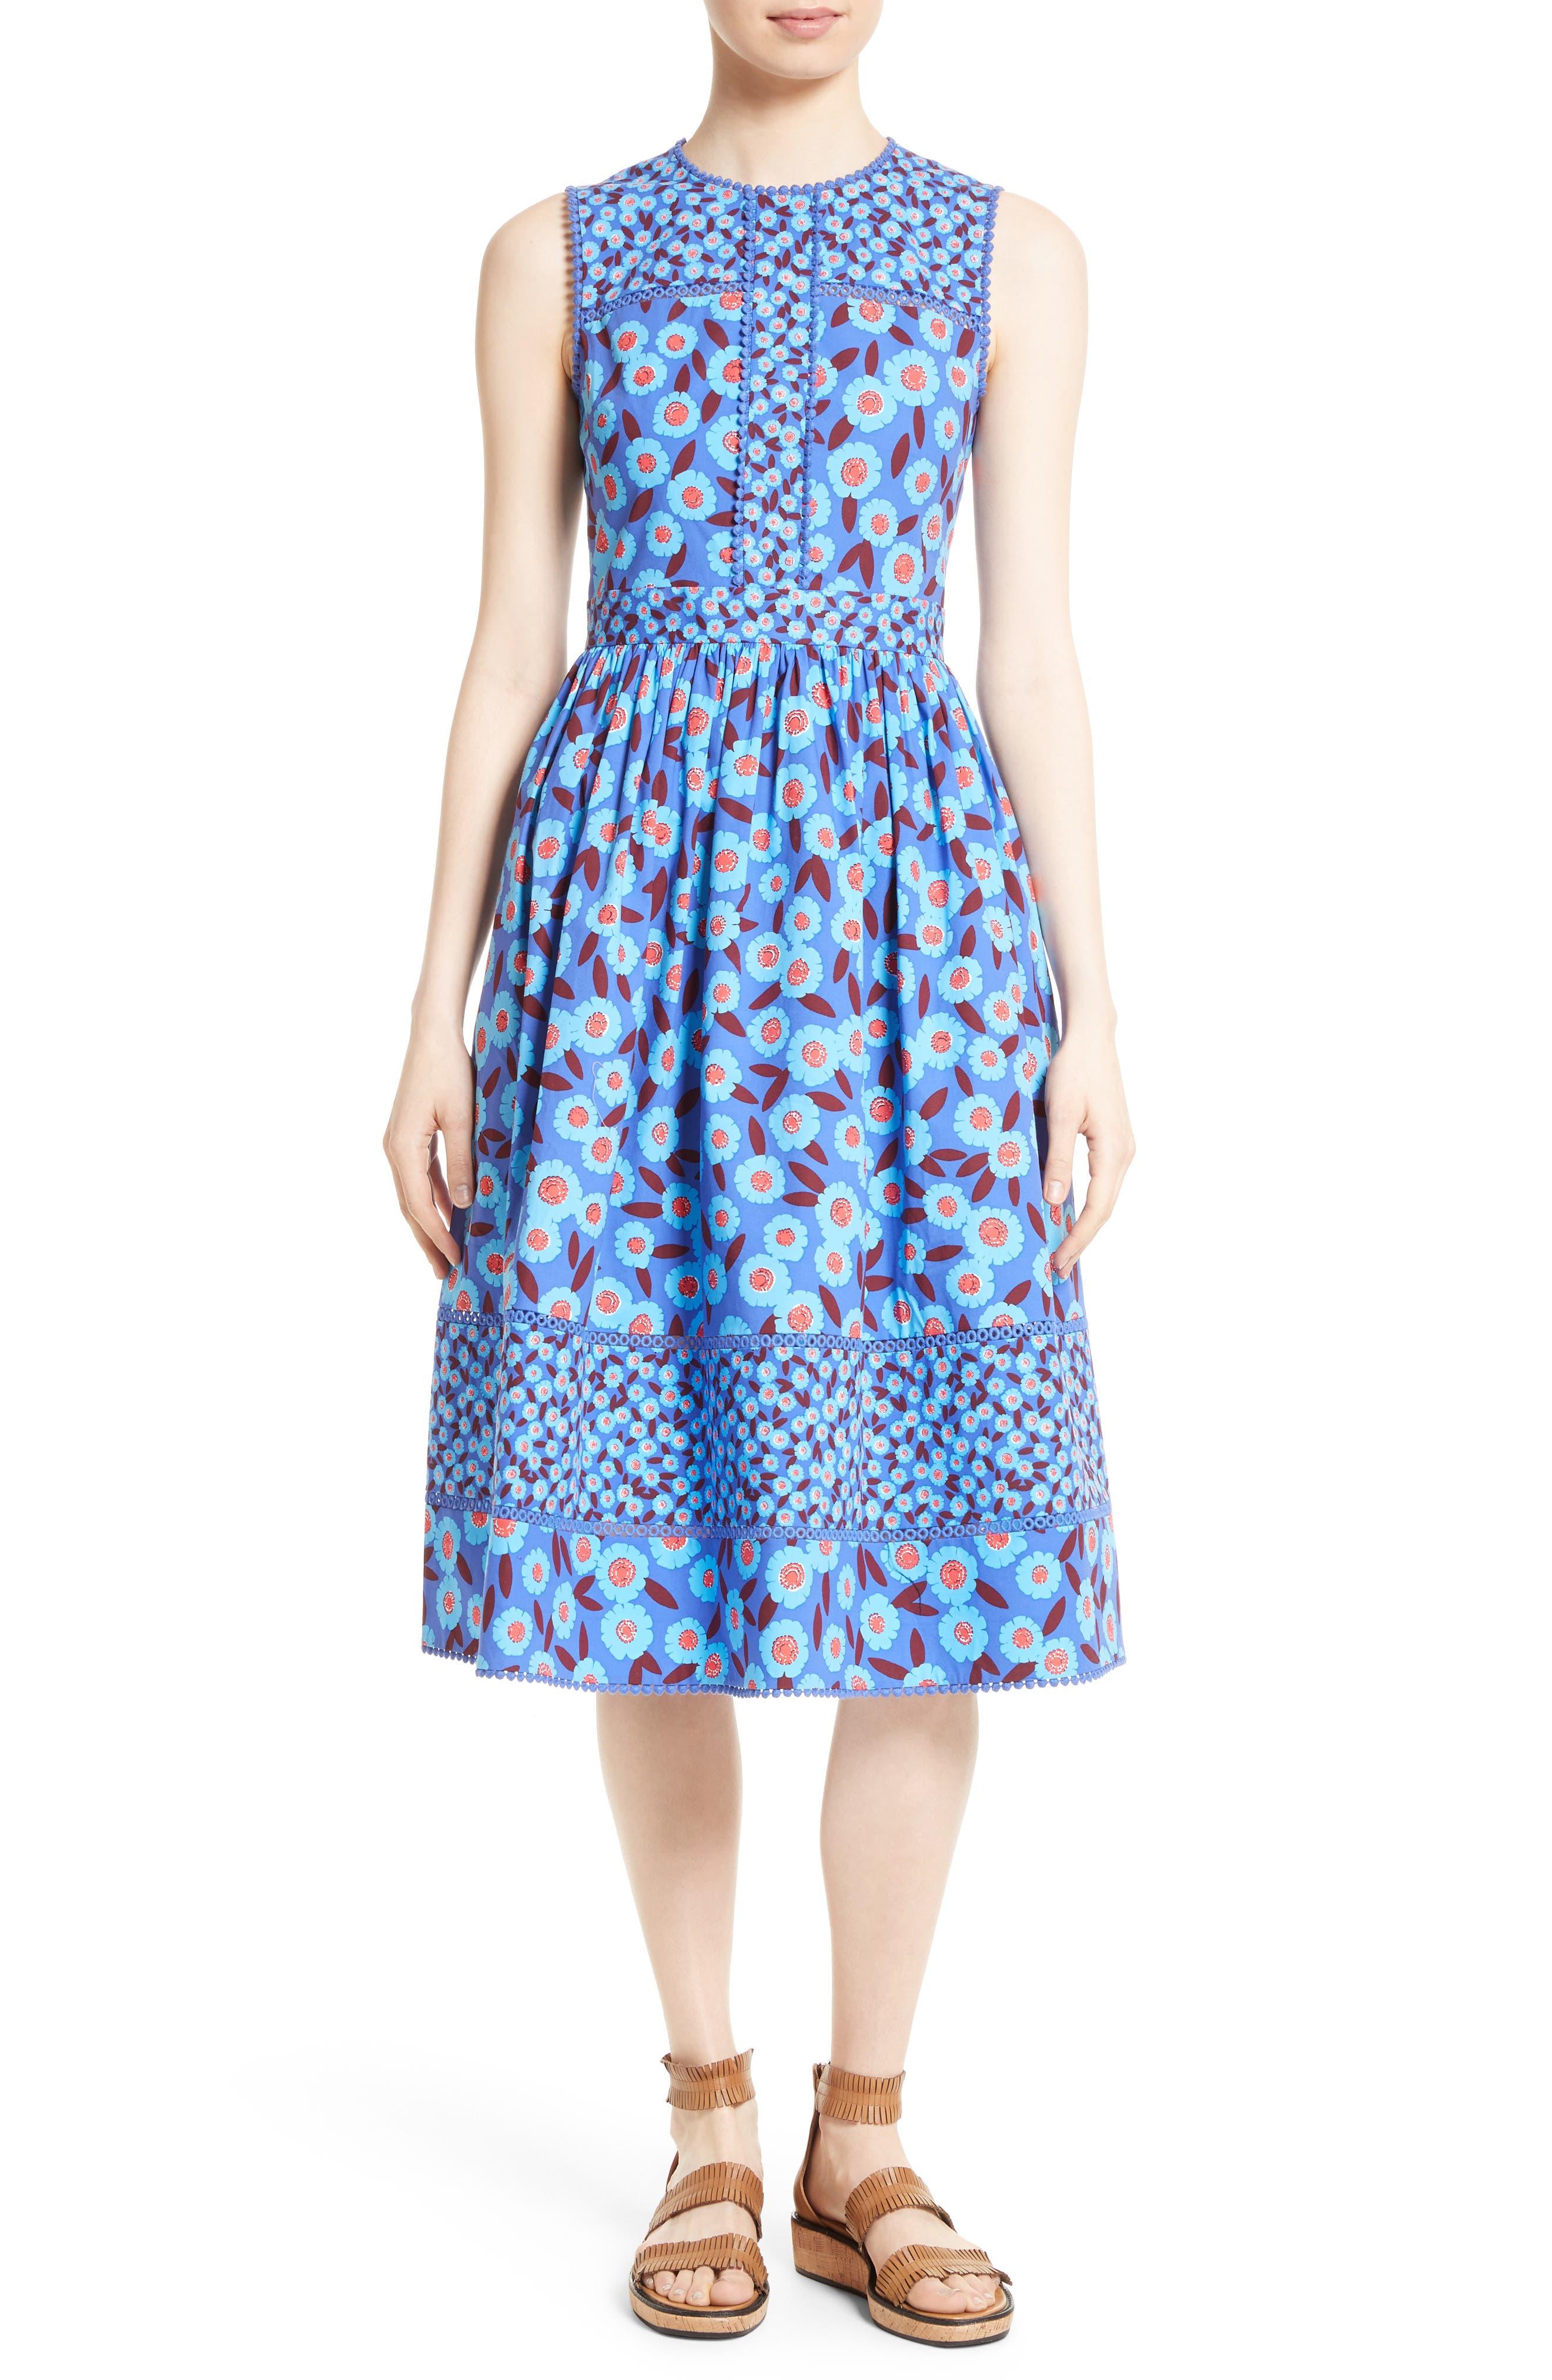 tangier floral midi dress,                             Main thumbnail 1, color,                             408